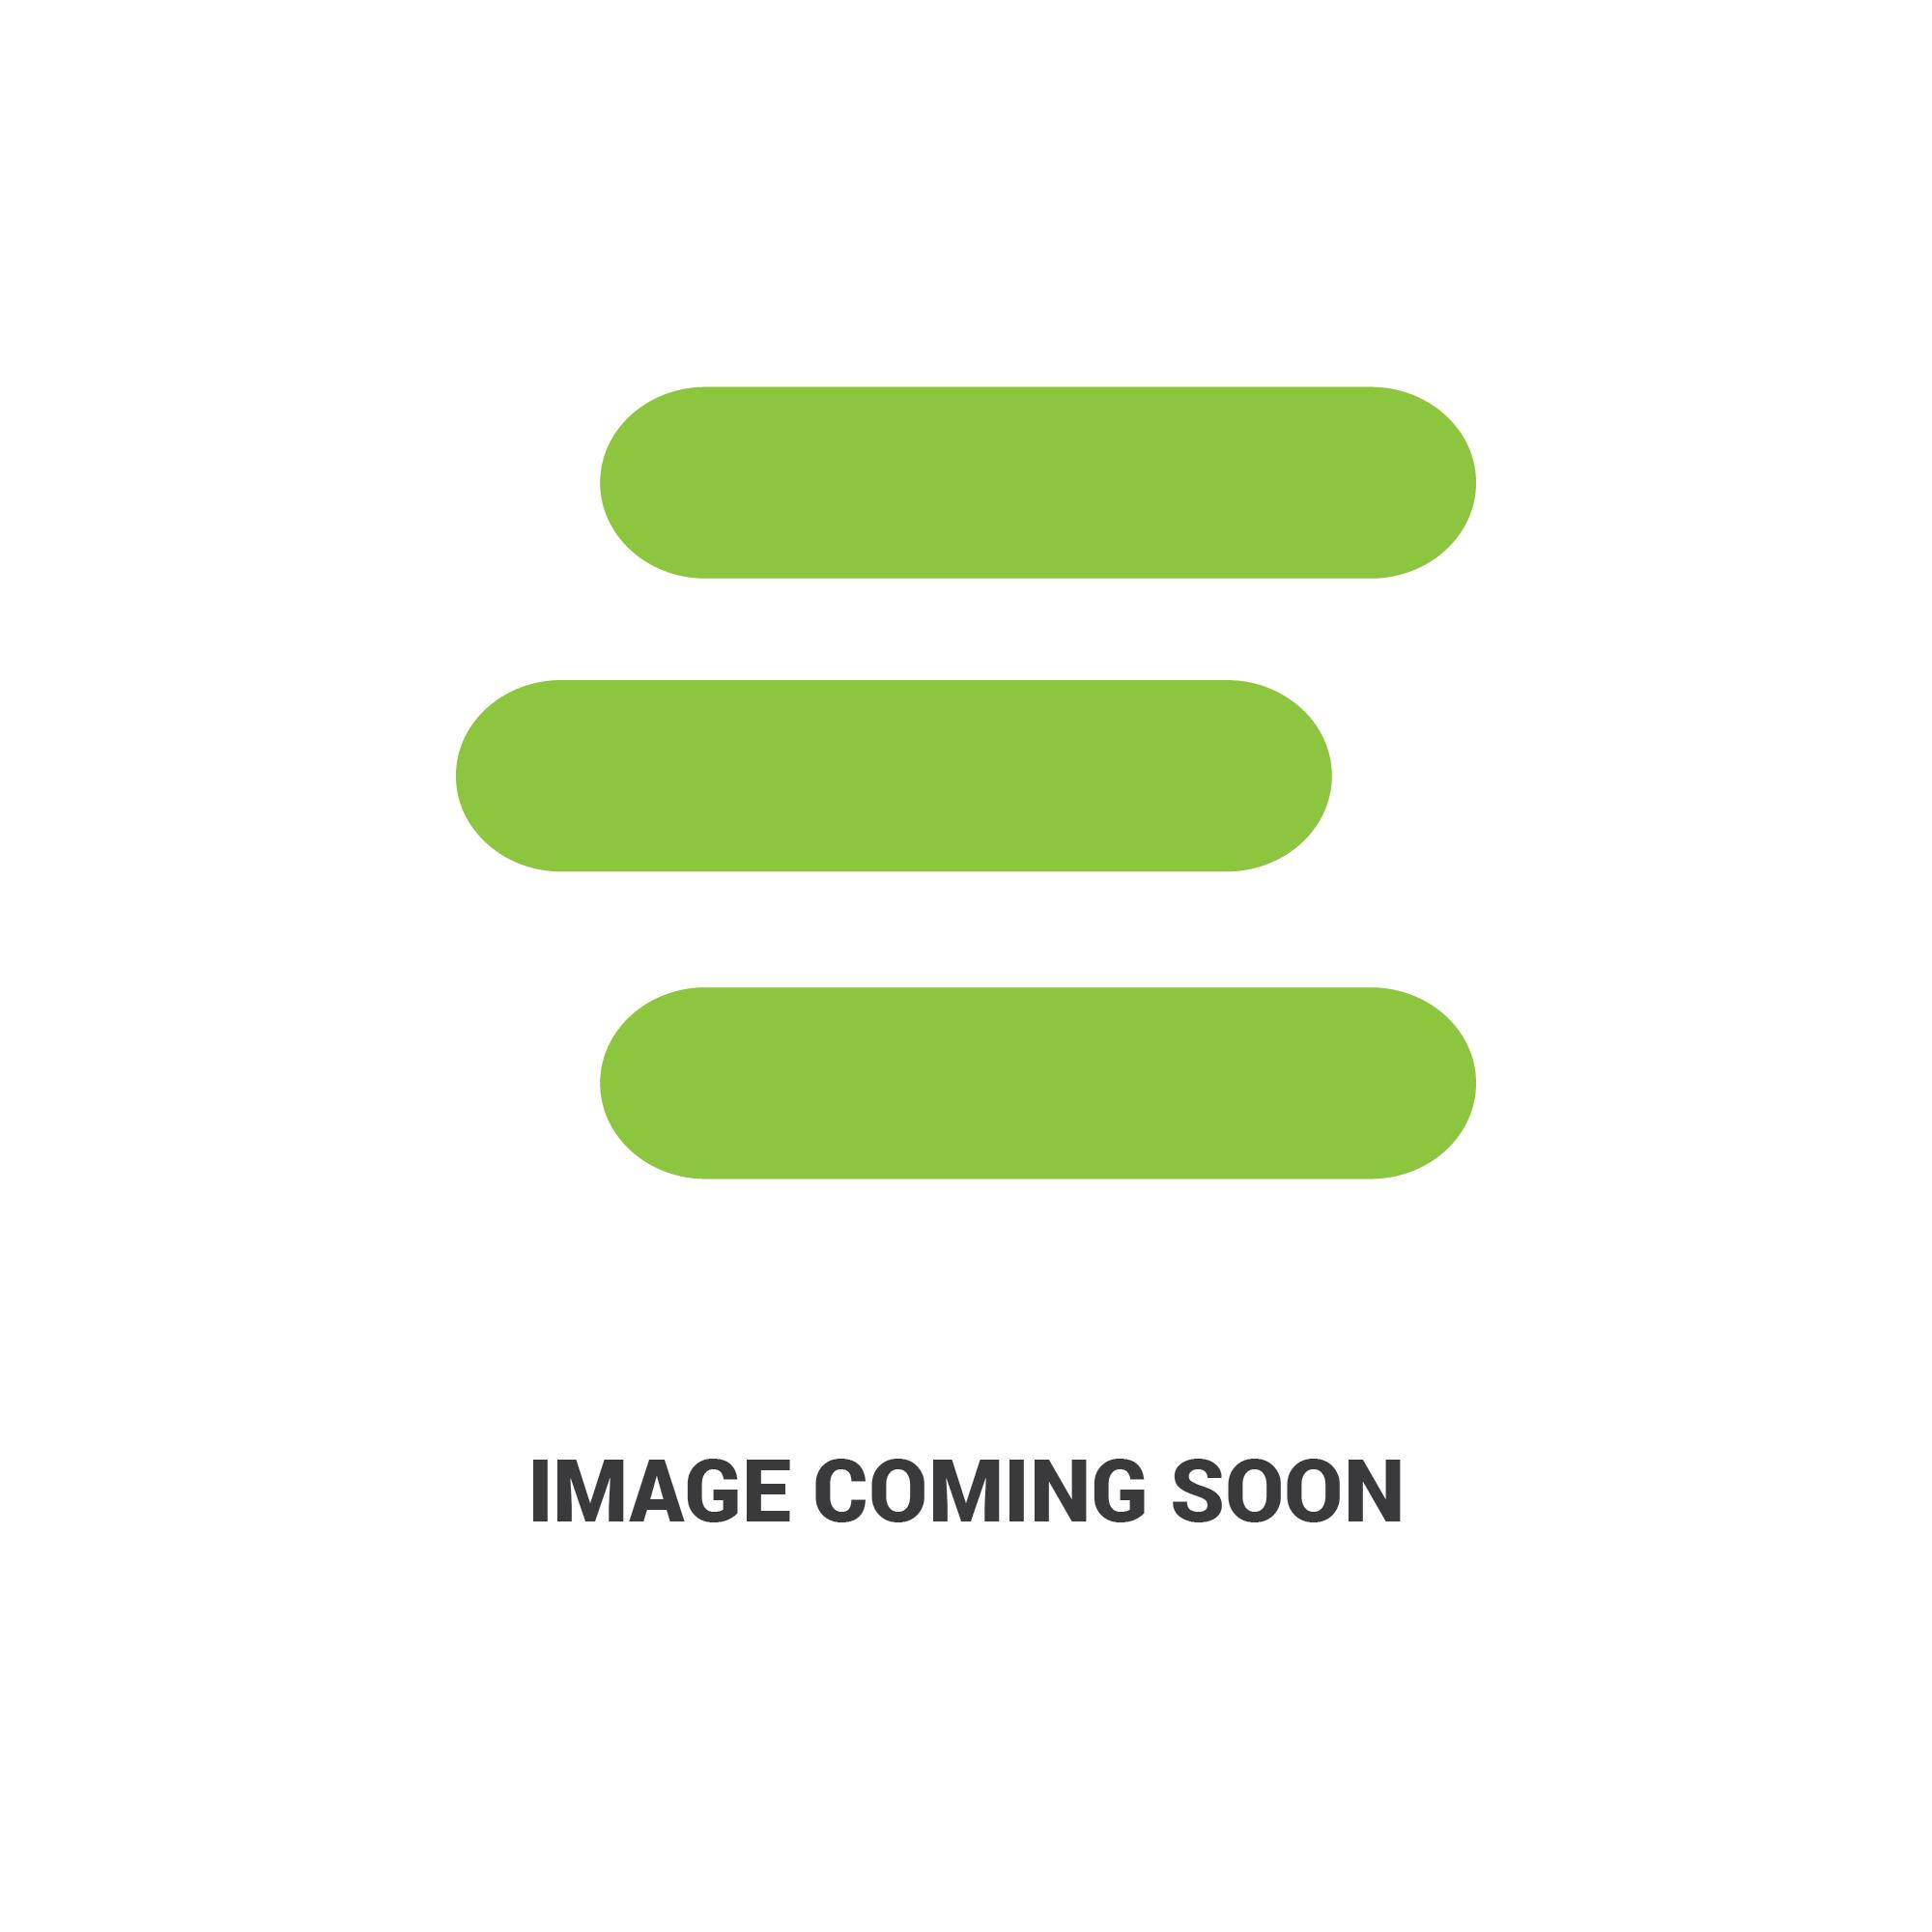 E-AXMR2433edit 1.jpg